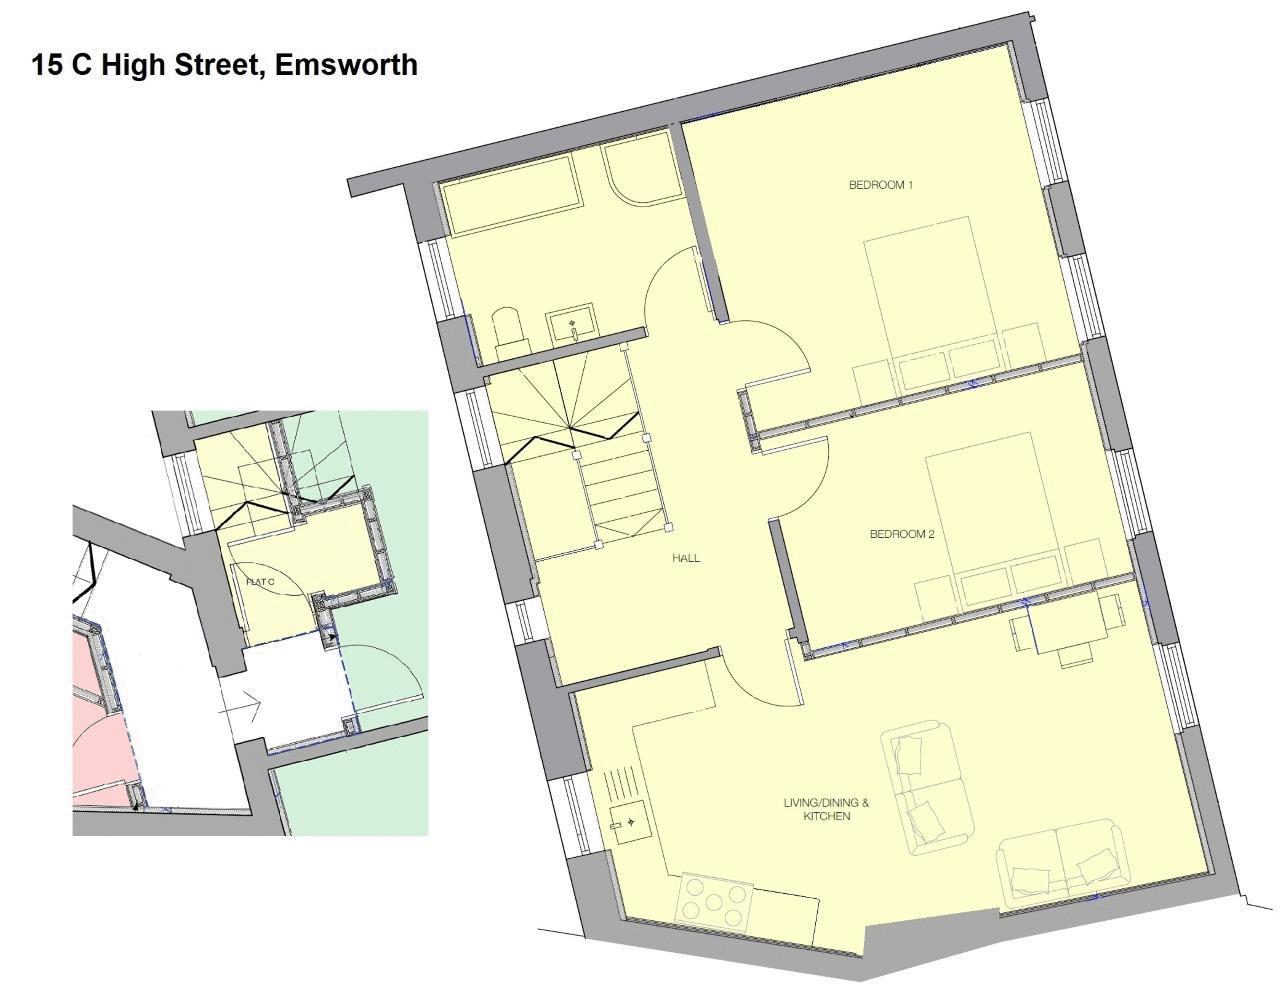 15c Floorplan